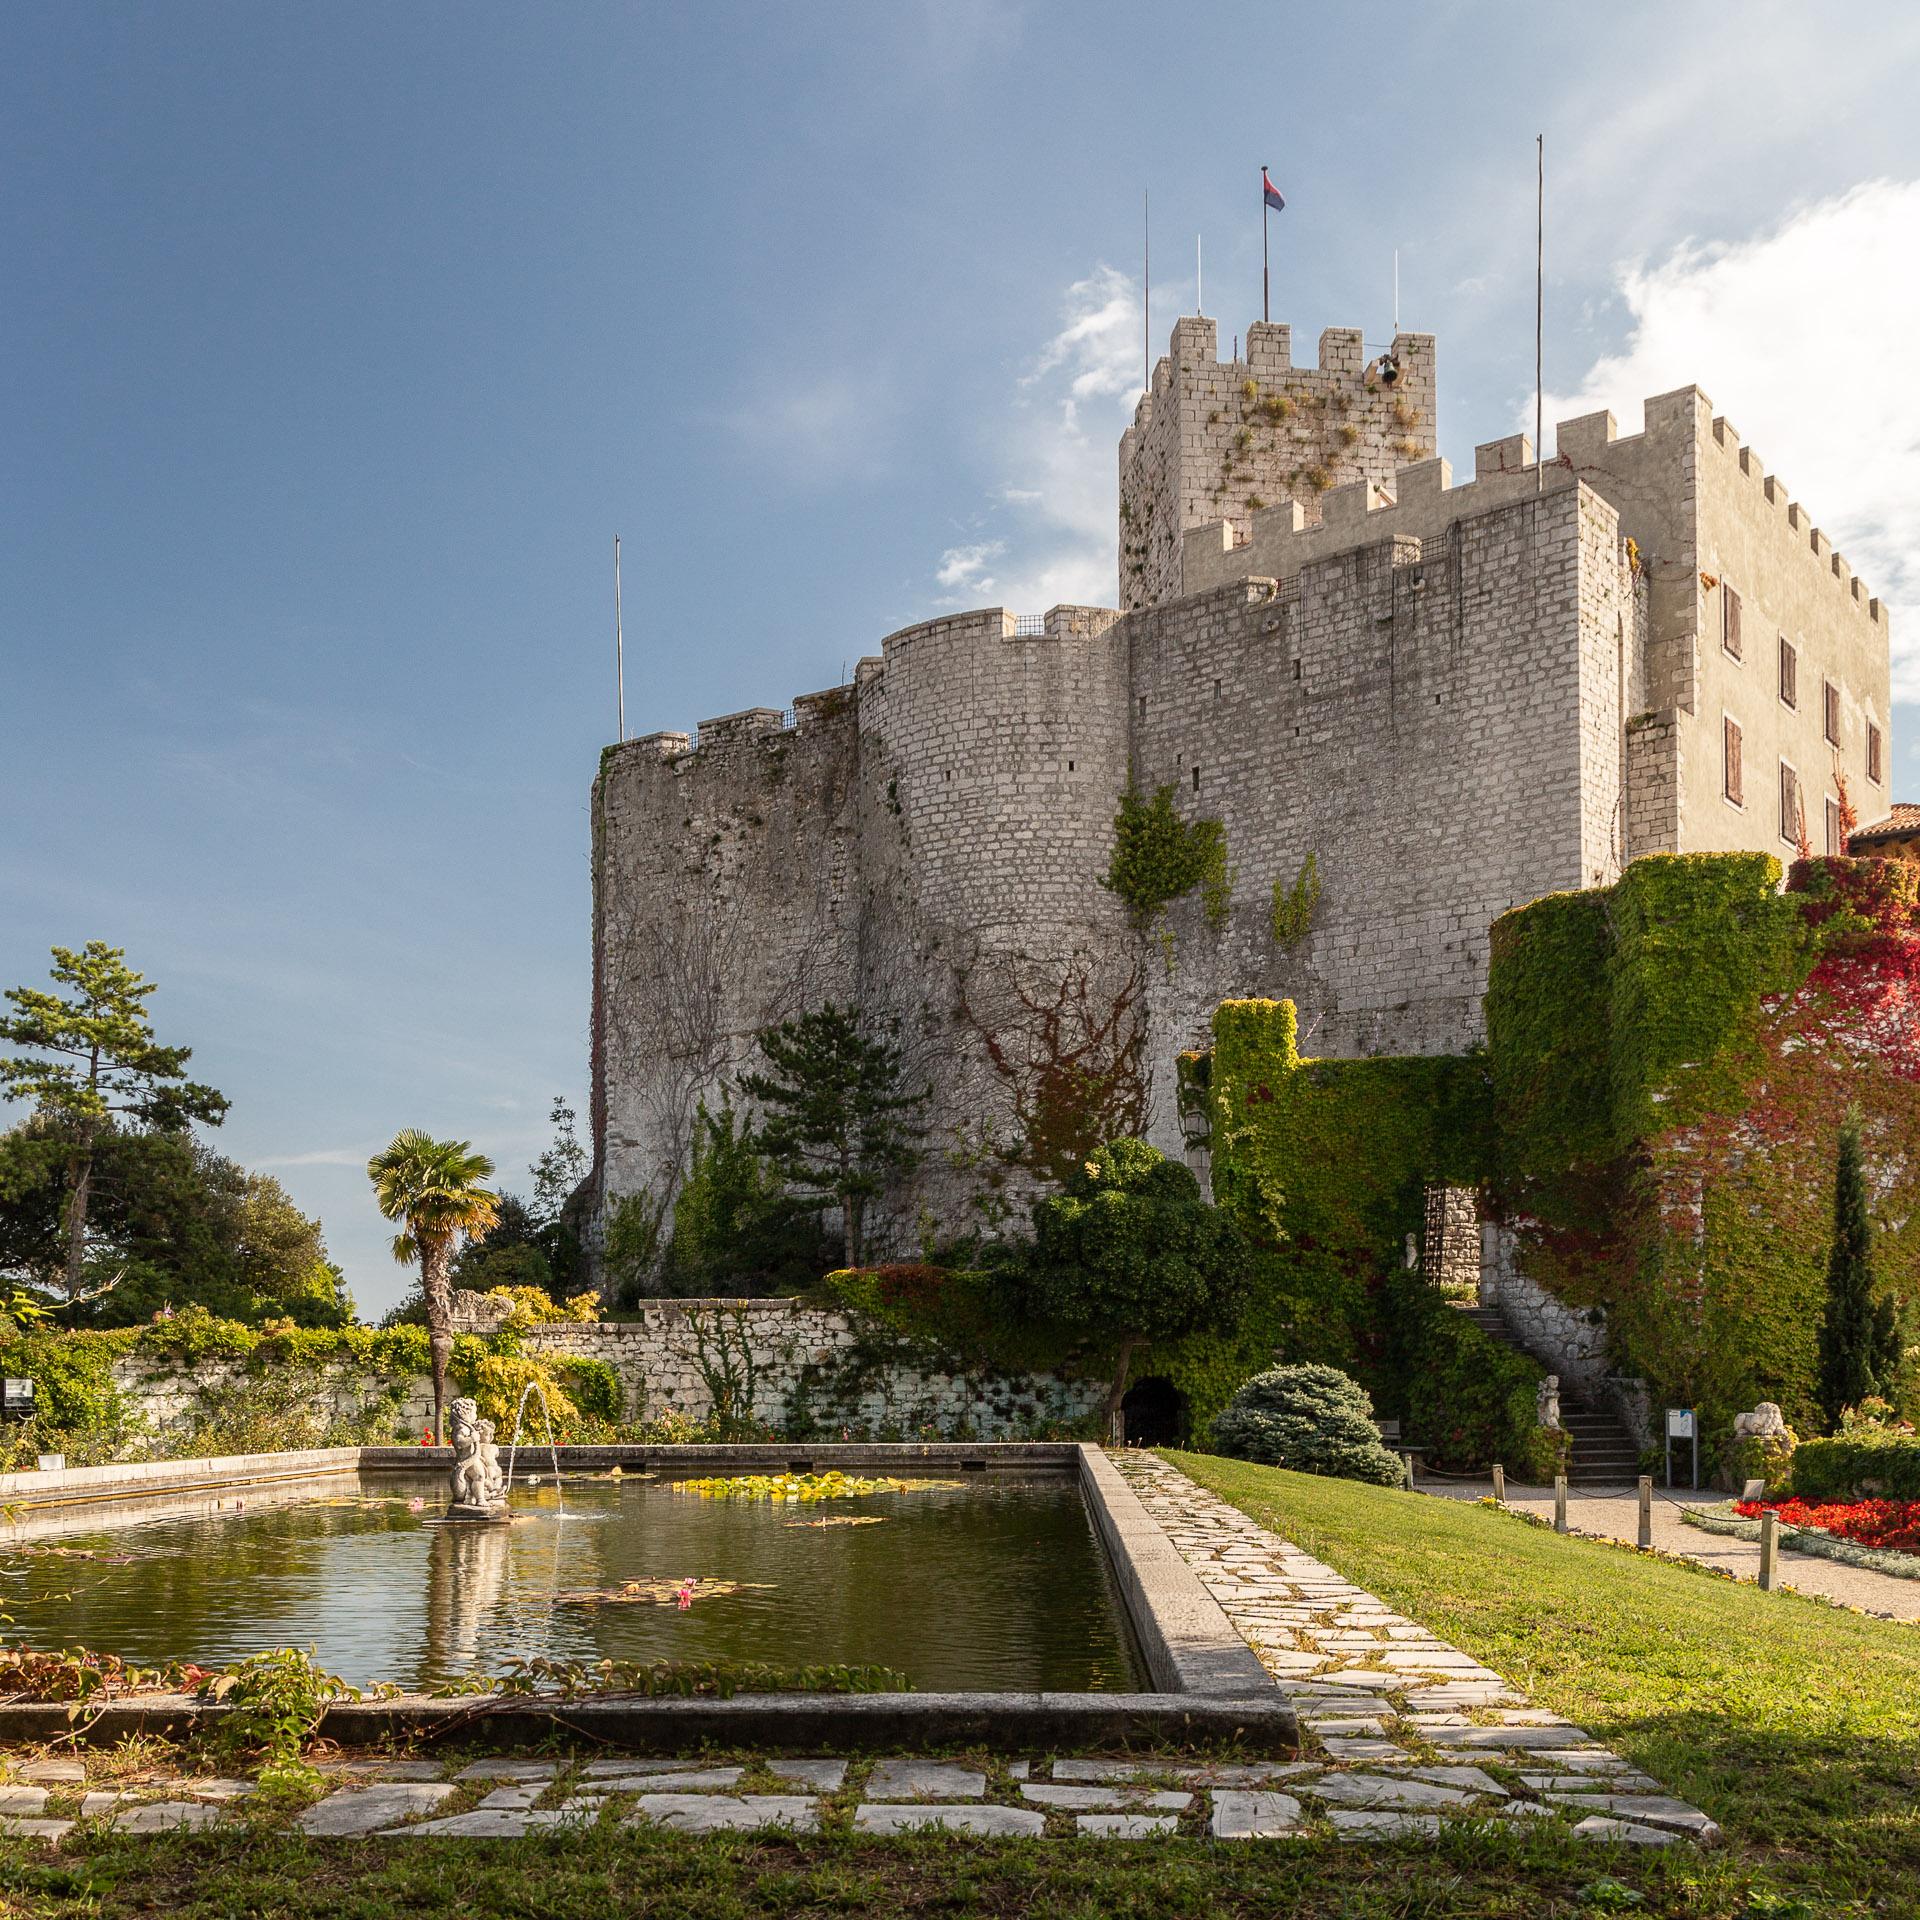 Blick vom kleinen Park neben dem Schloss